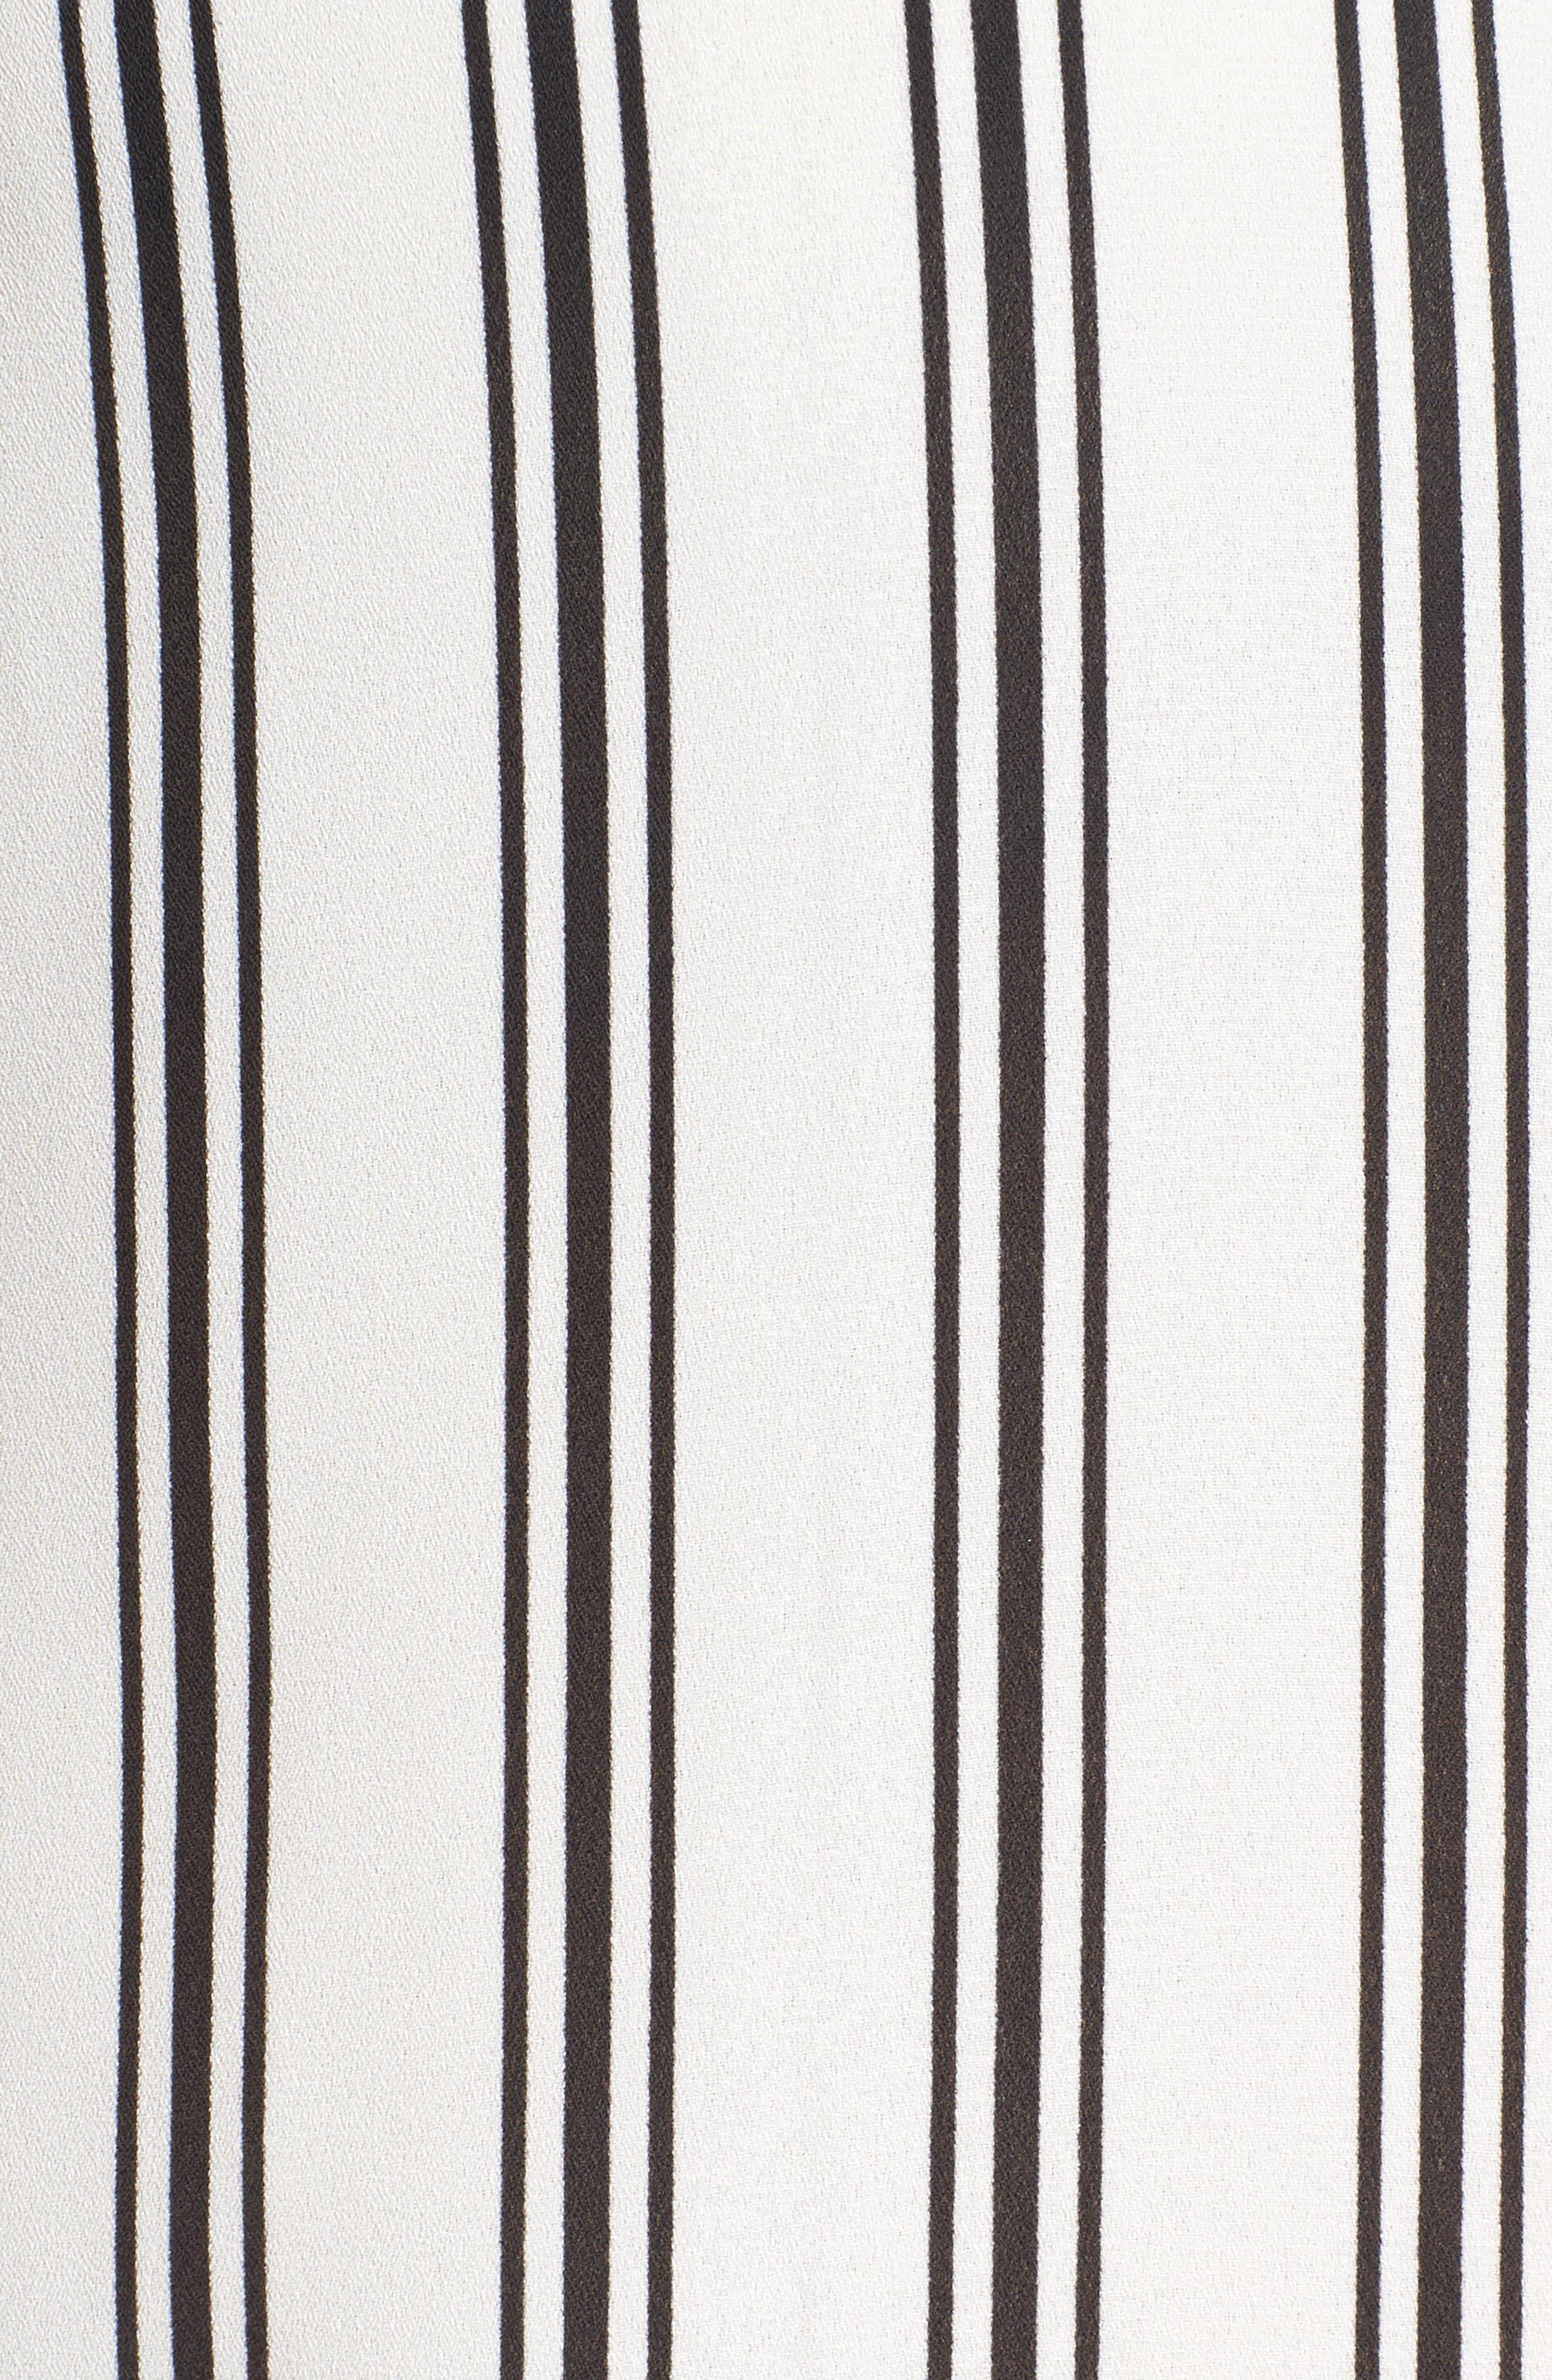 Stripe Puff Sleeve Blouse,                             Alternate thumbnail 5, color,                             901